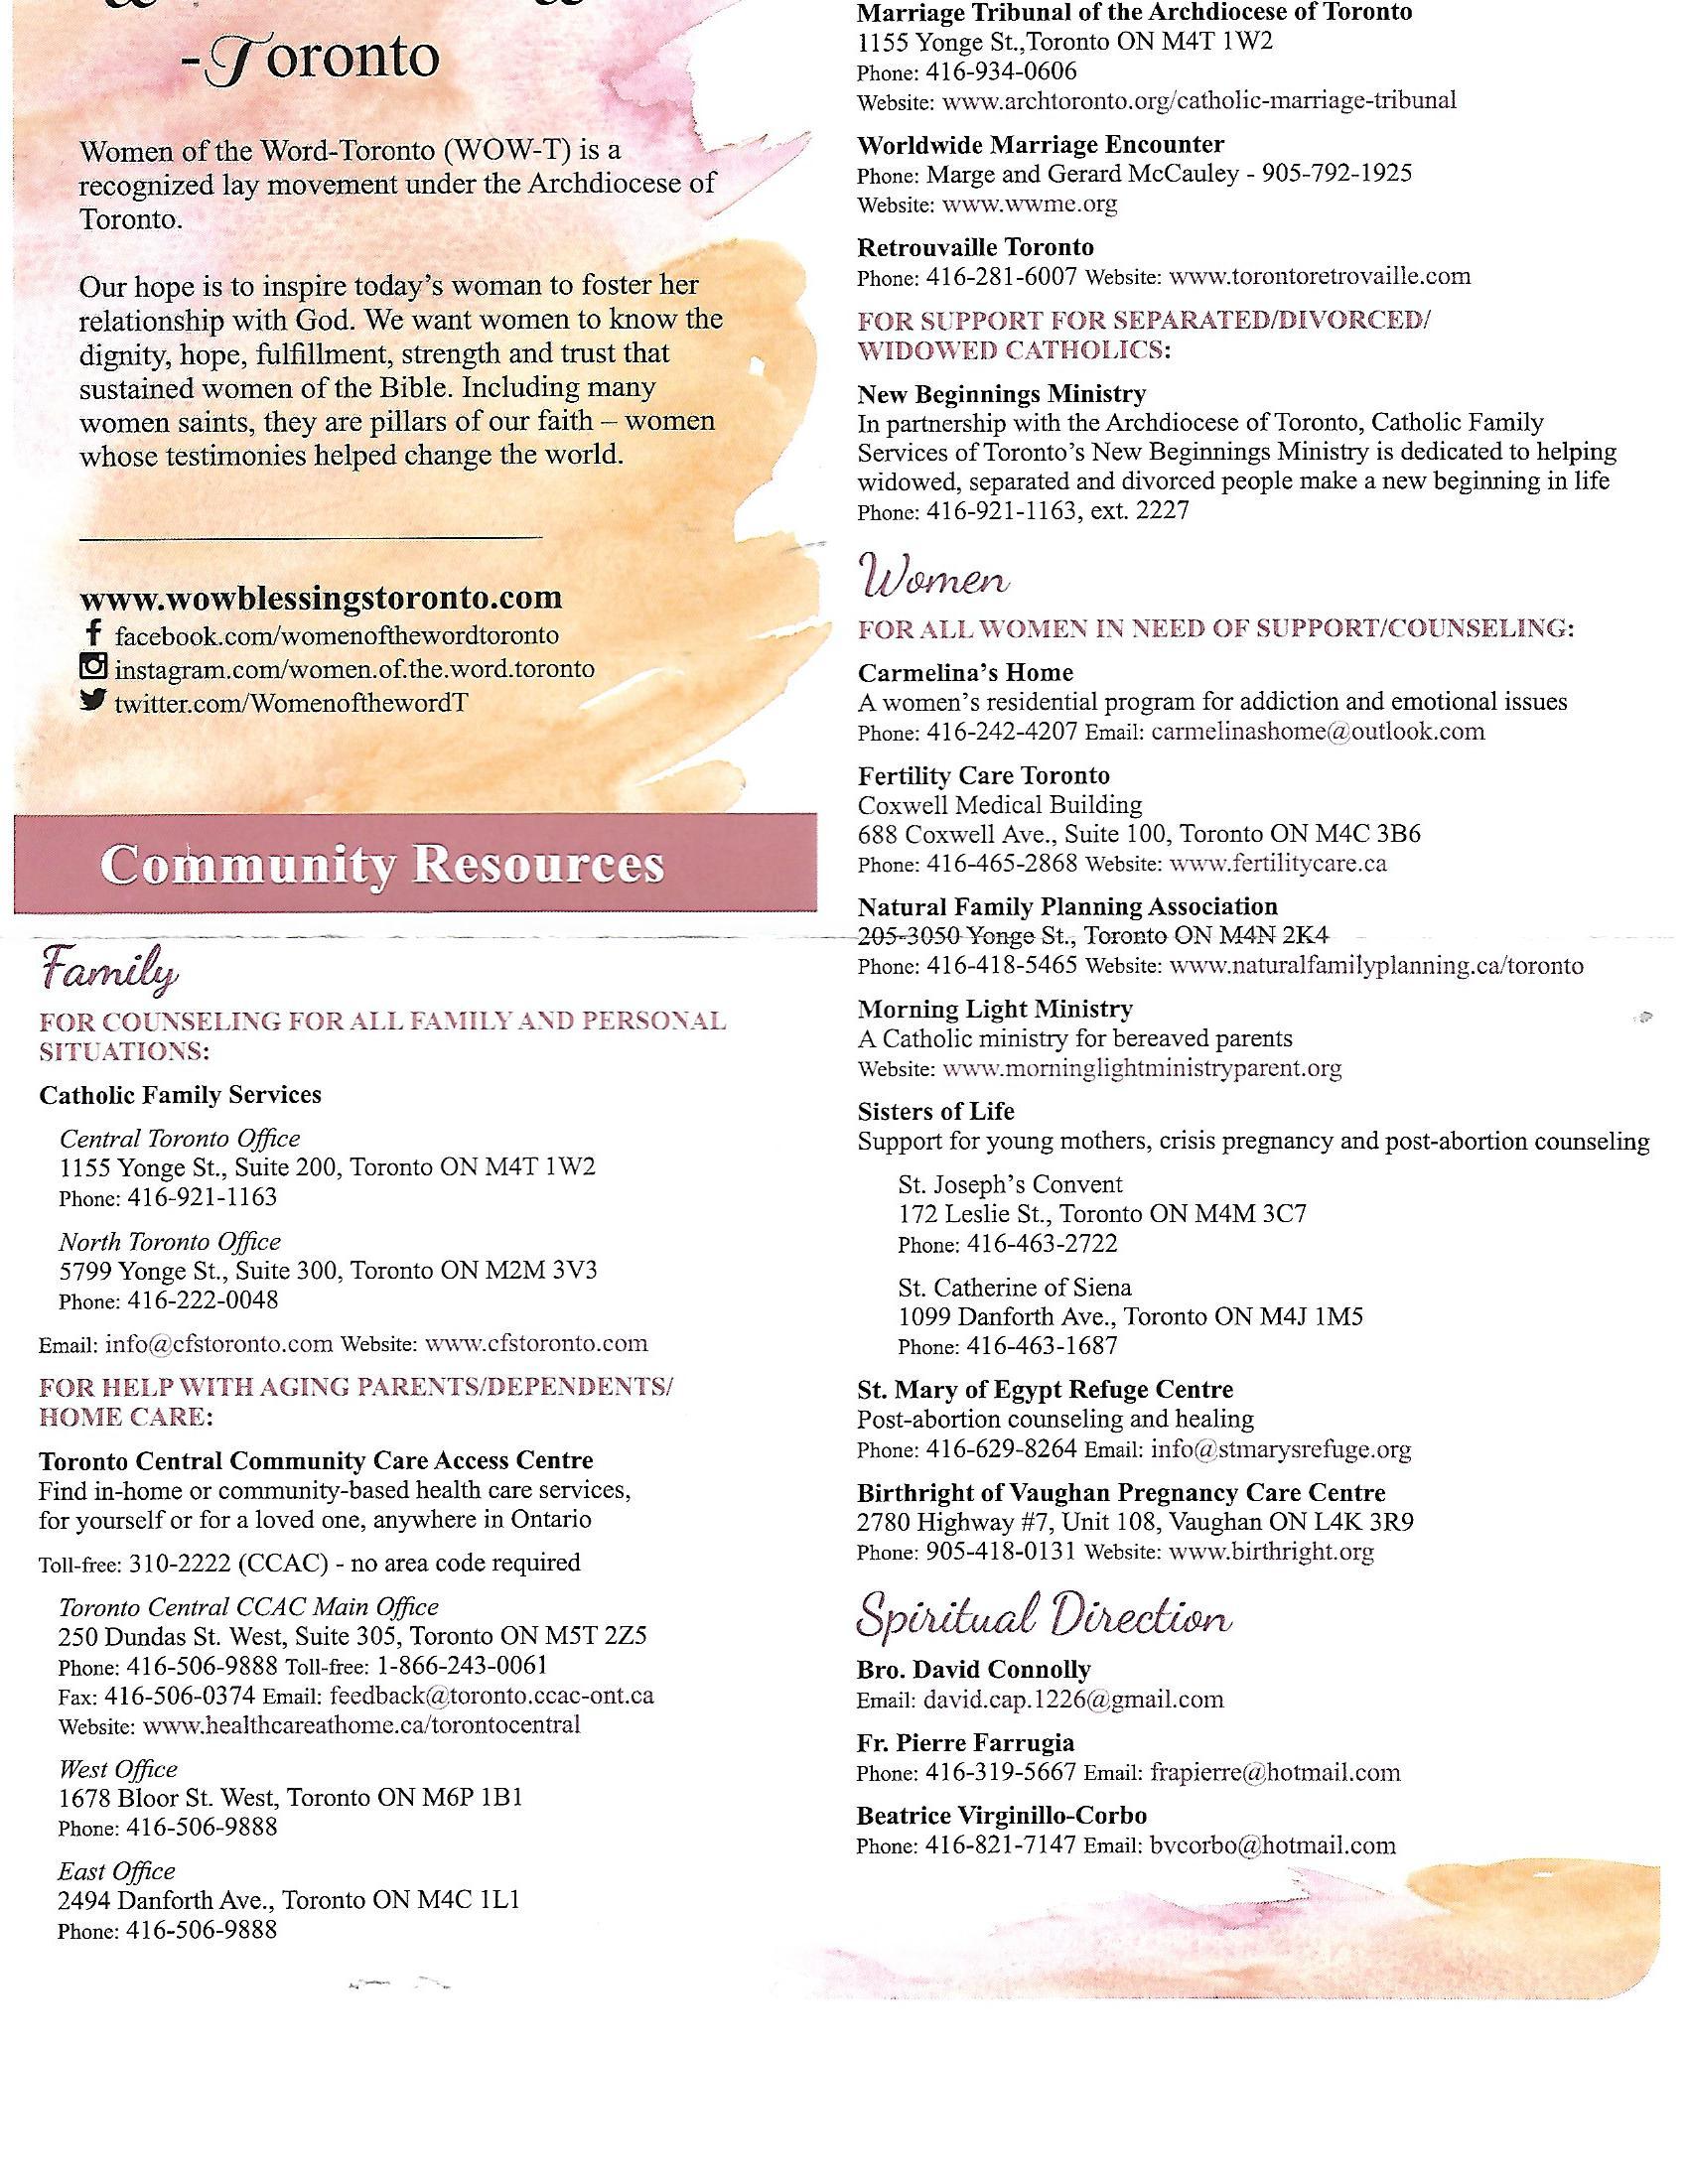 Community Resource Sheet